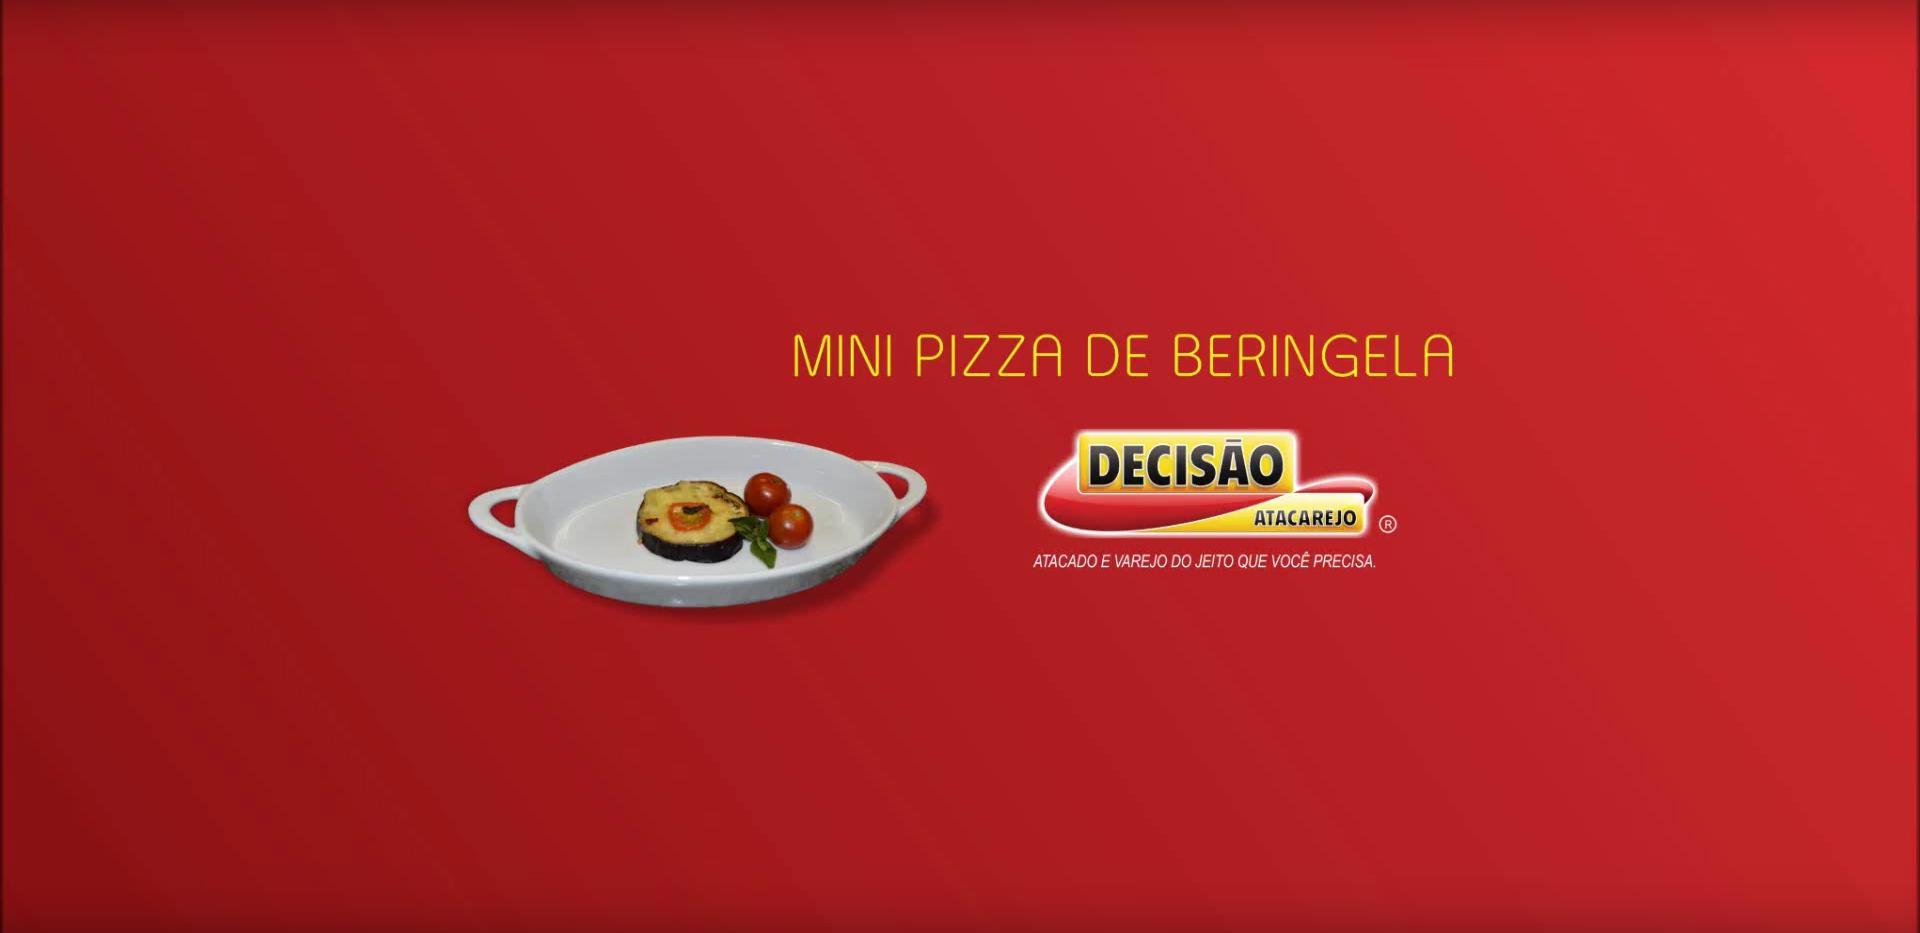 Mini Pizza de Berinjela - Decisão Atacarejo